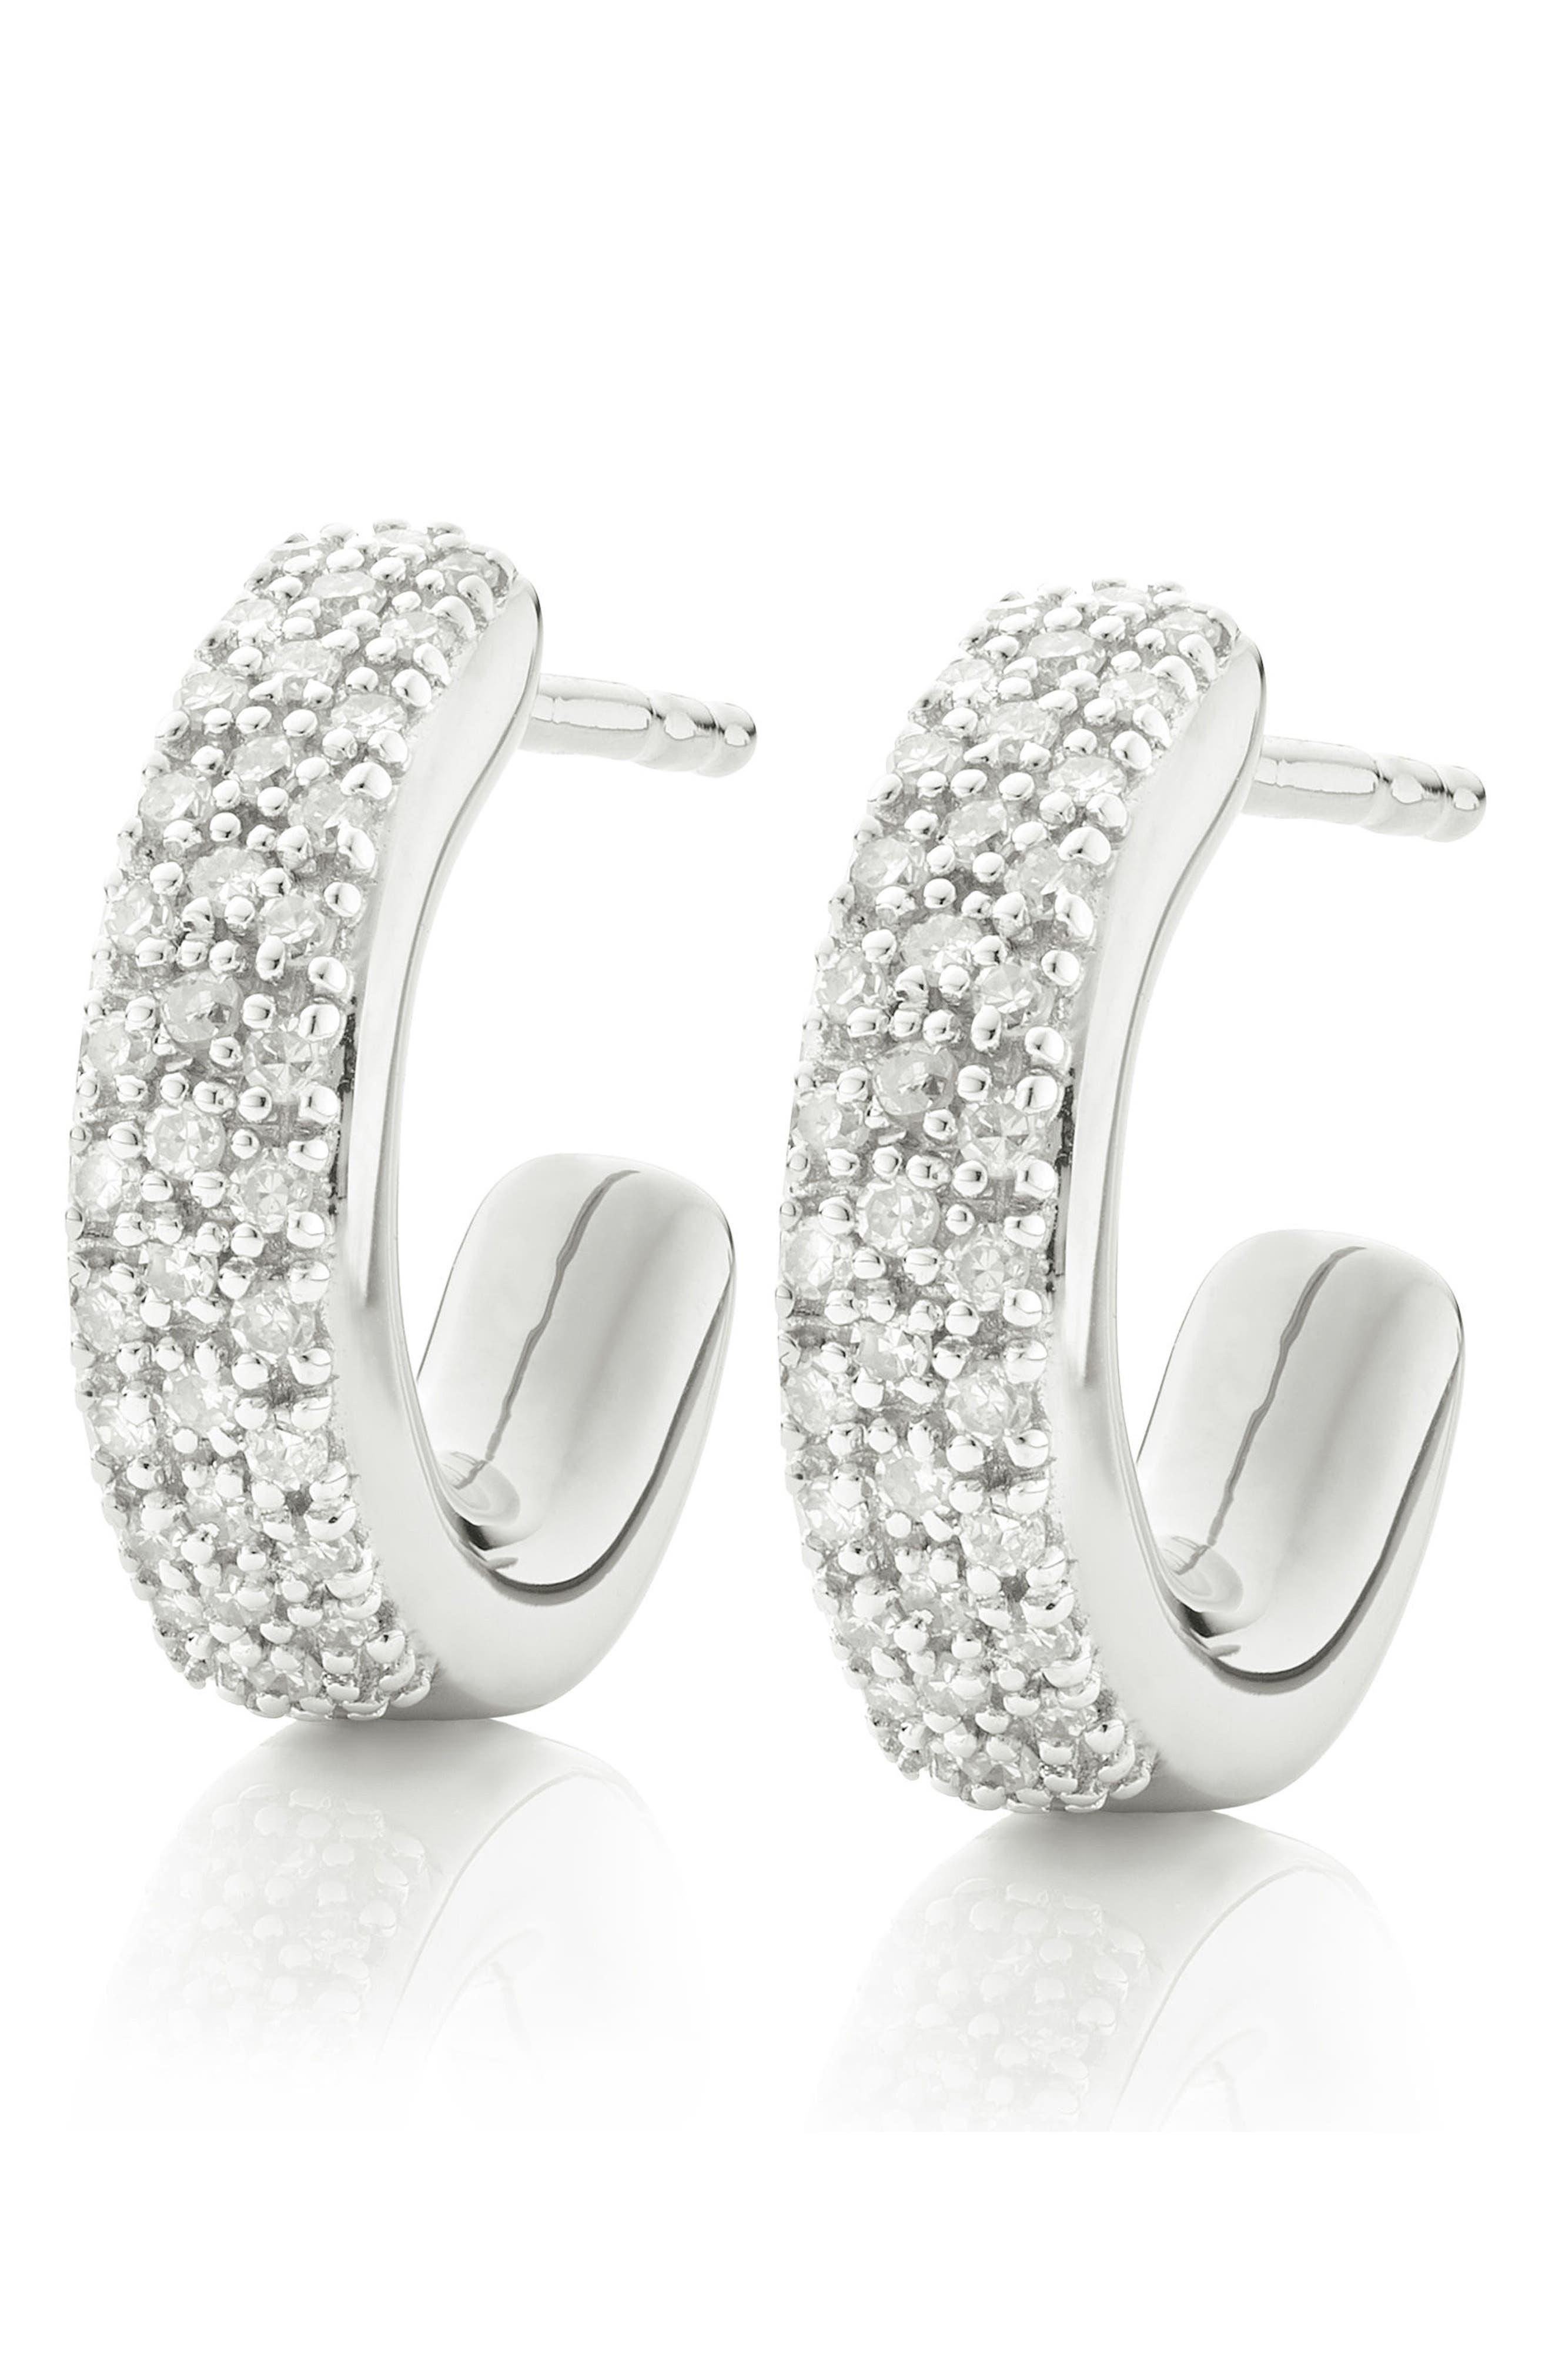 Fiji Mini Diamond Hoop Earrings,                             Alternate thumbnail 4, color,                             Silver